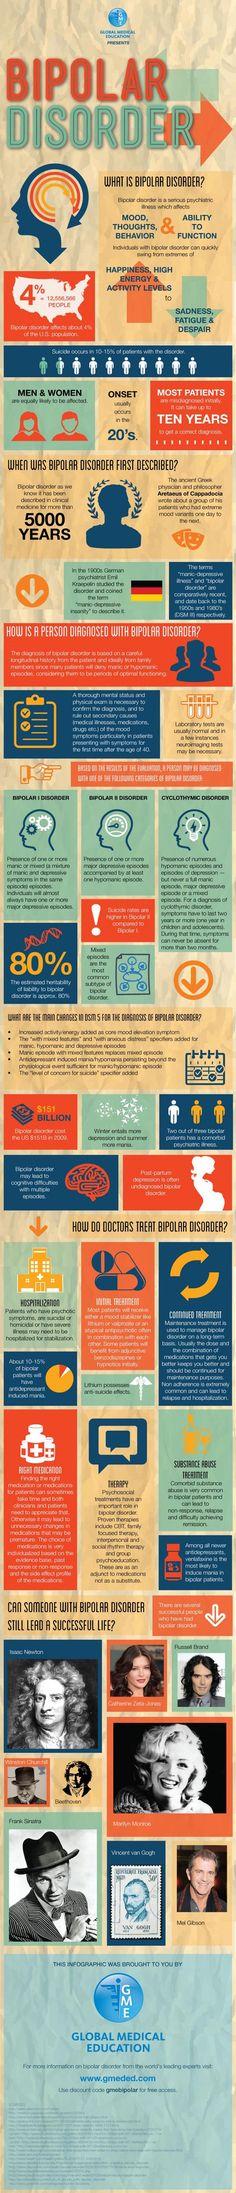 Bipolar Disorder [INFOGRAPHIC] #Bipolar #Disorder #infographic